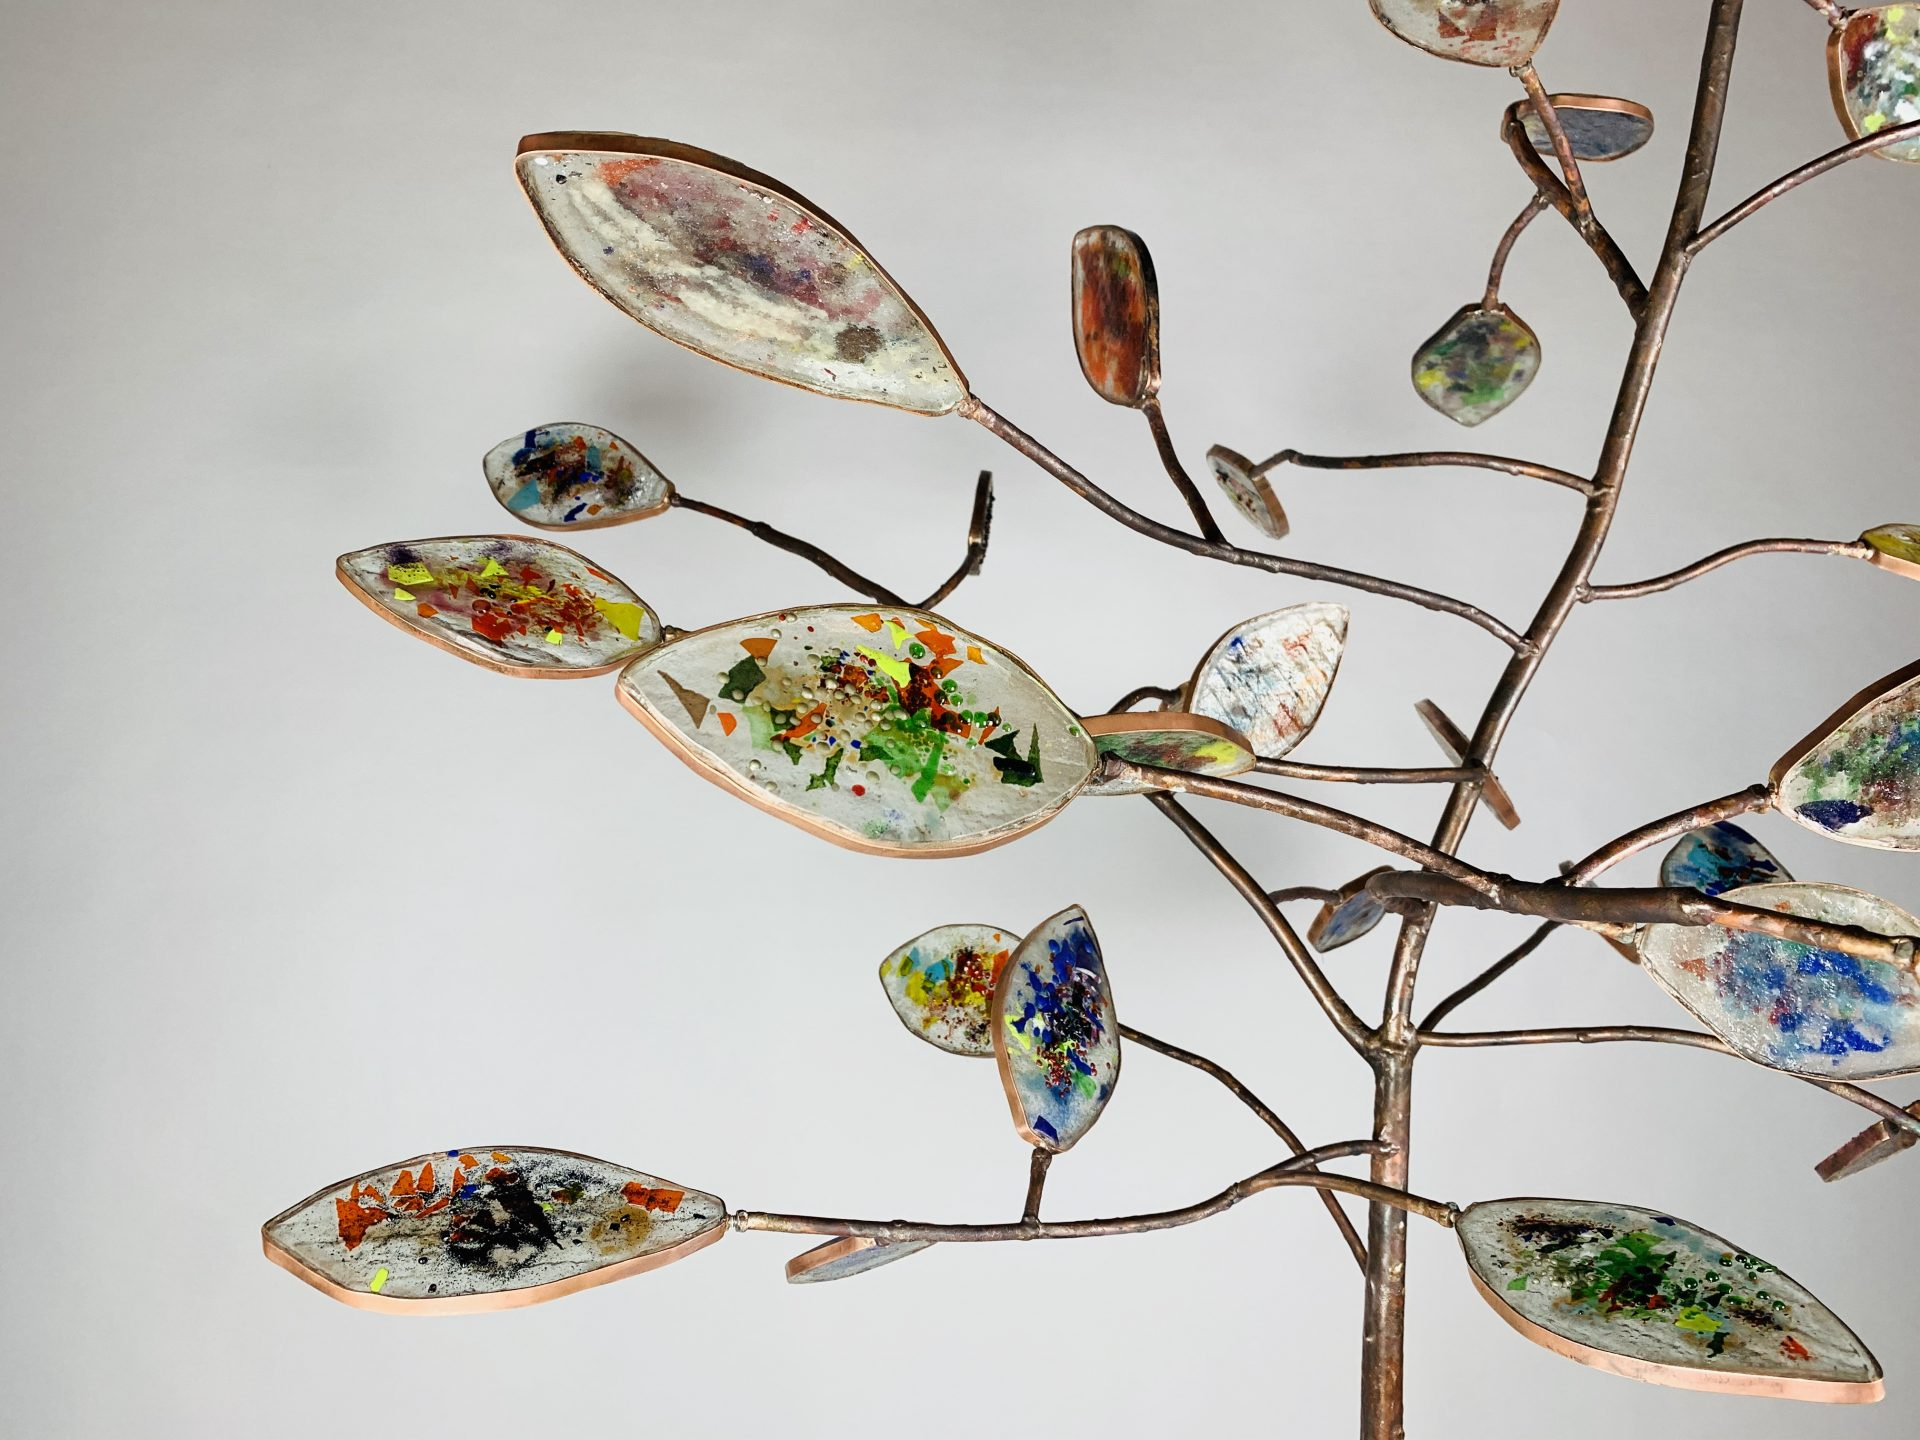 Tree of life 2,05 hoog x1,45x1,35 SJAAK SMETSERS 13